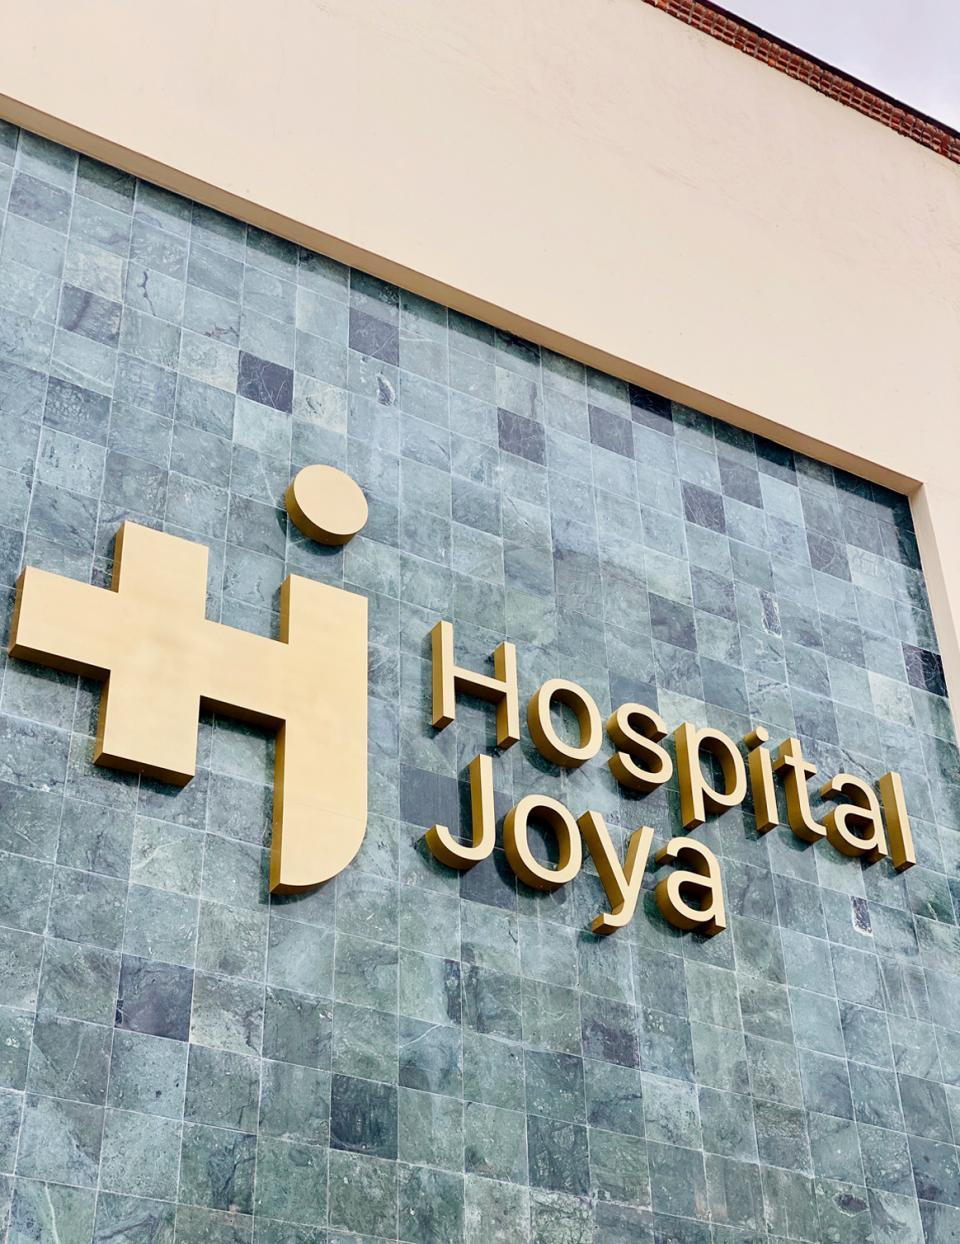 Hospital Joya